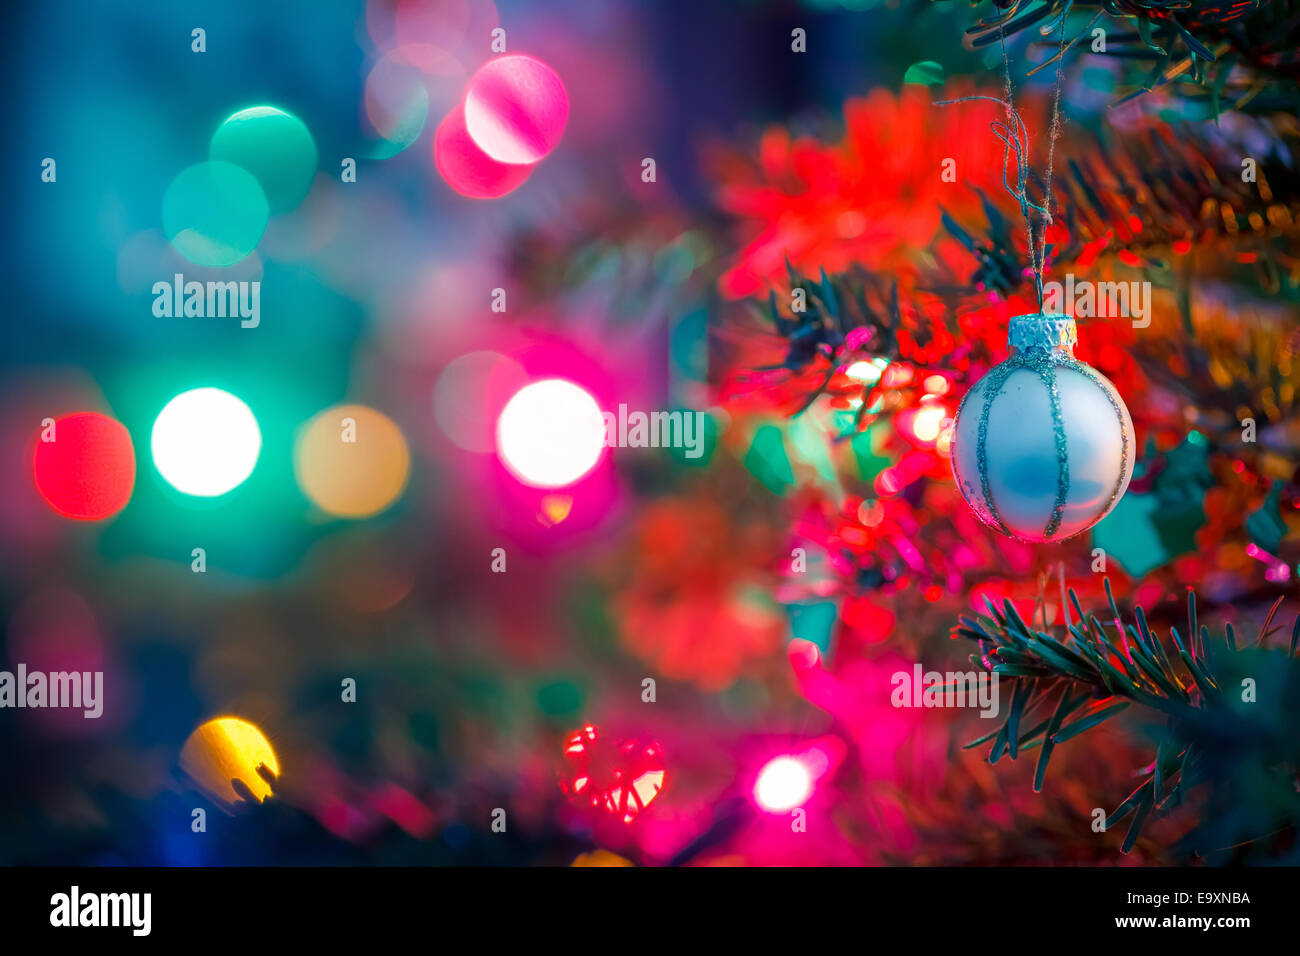 Decorated x-mas tree - Stock Image